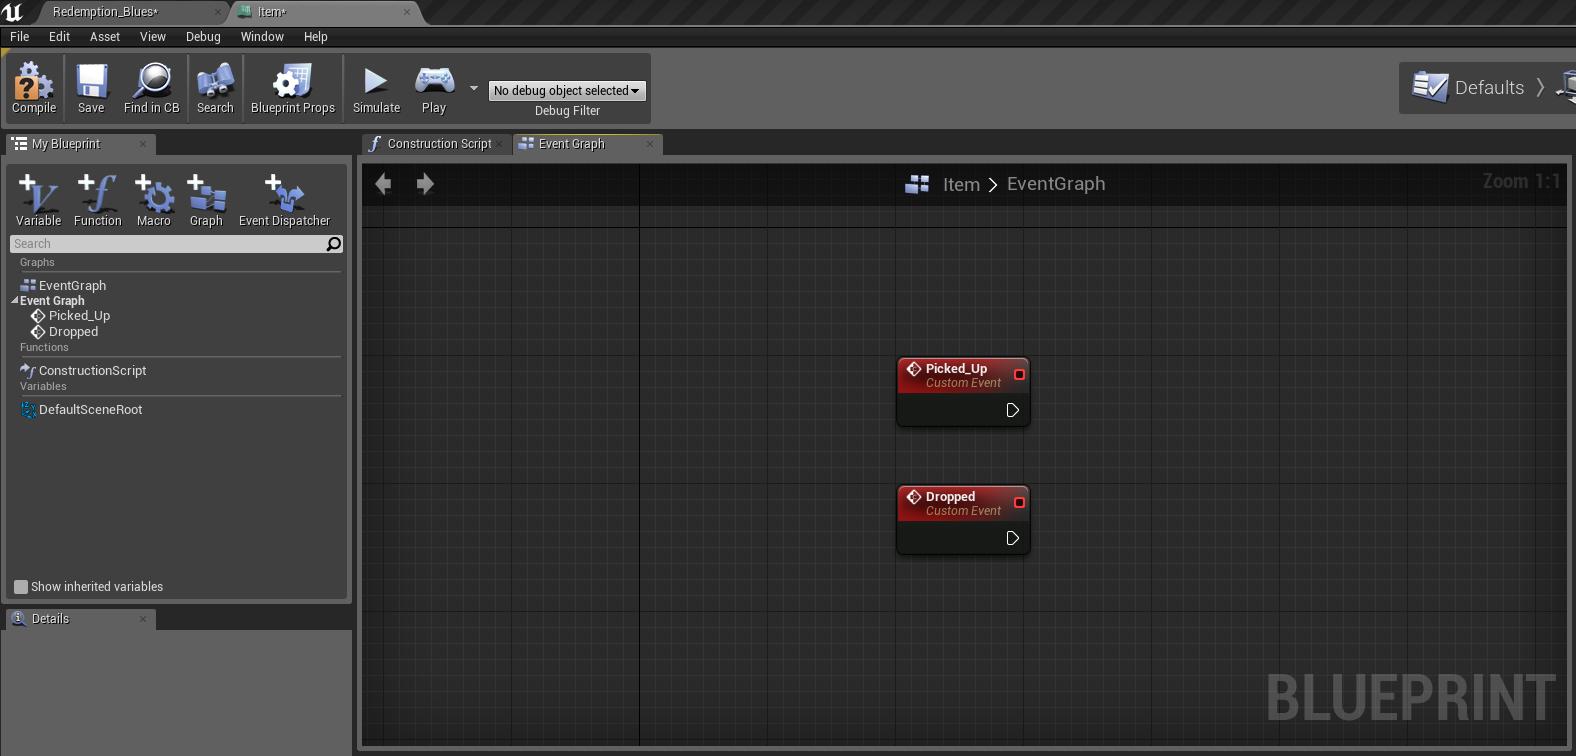 File:BlueprintCreate.png